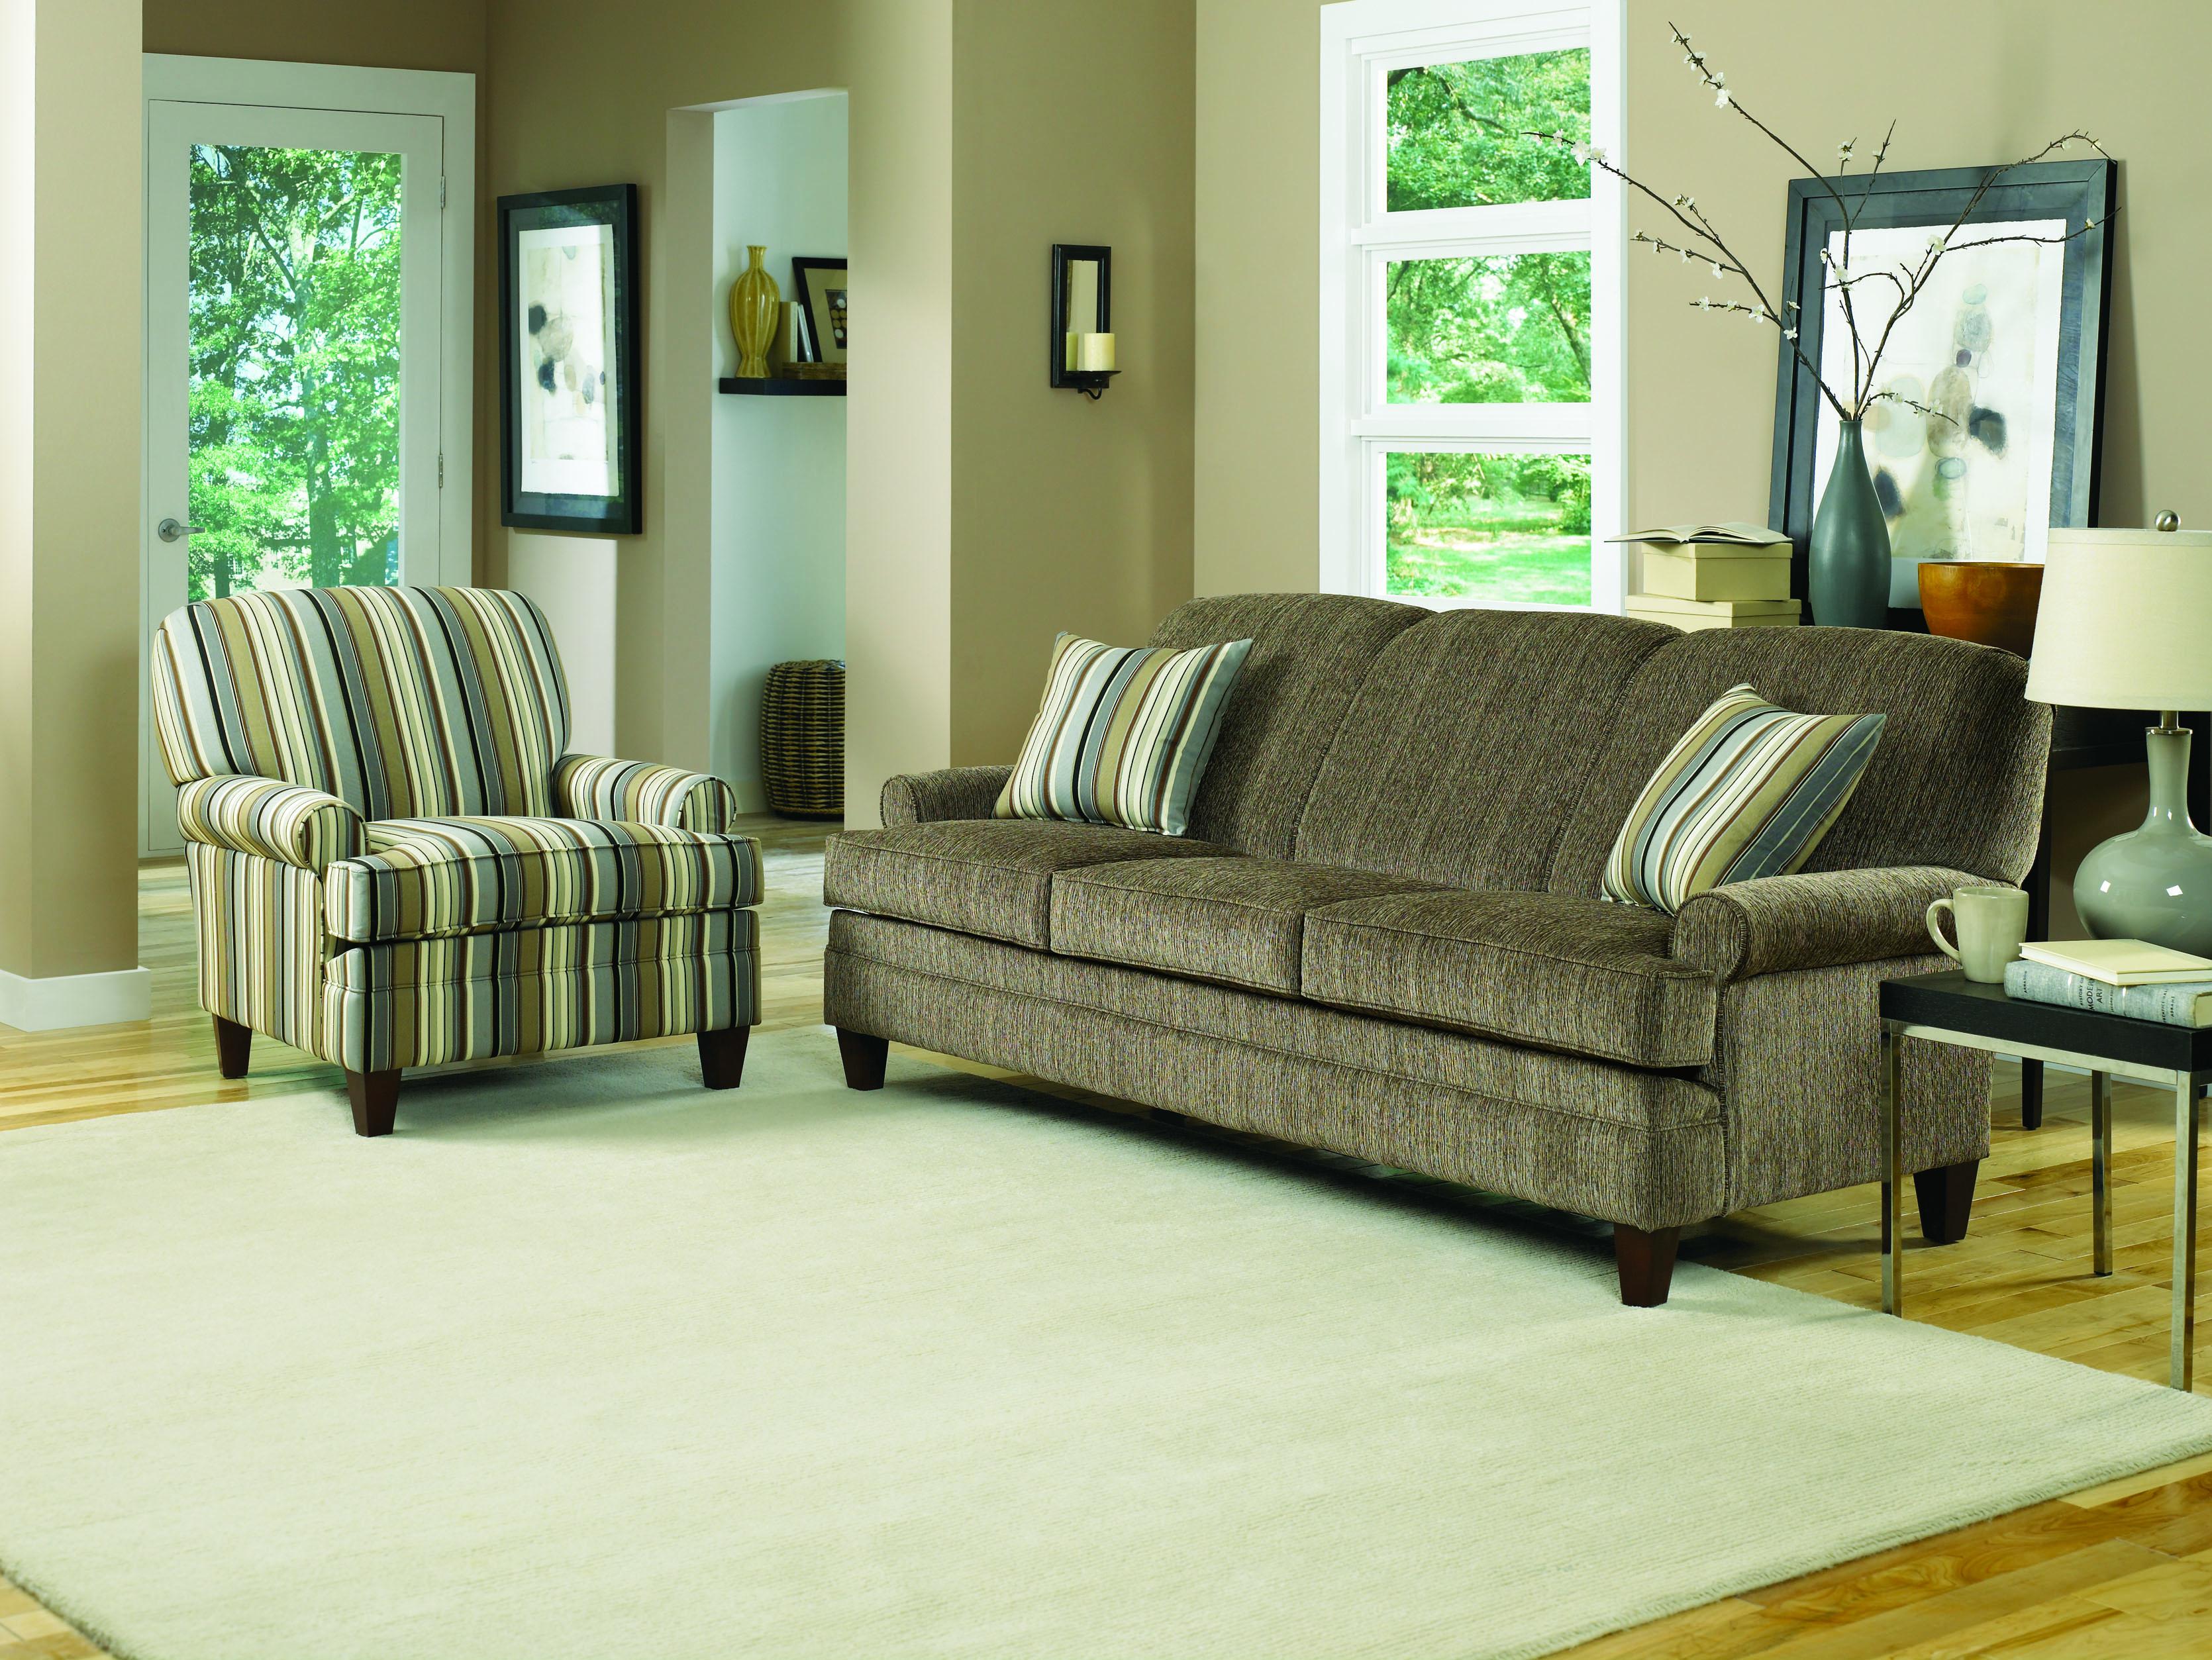 Charles Schneider Furnitureavailable At Abe Krasne Home Furnishings